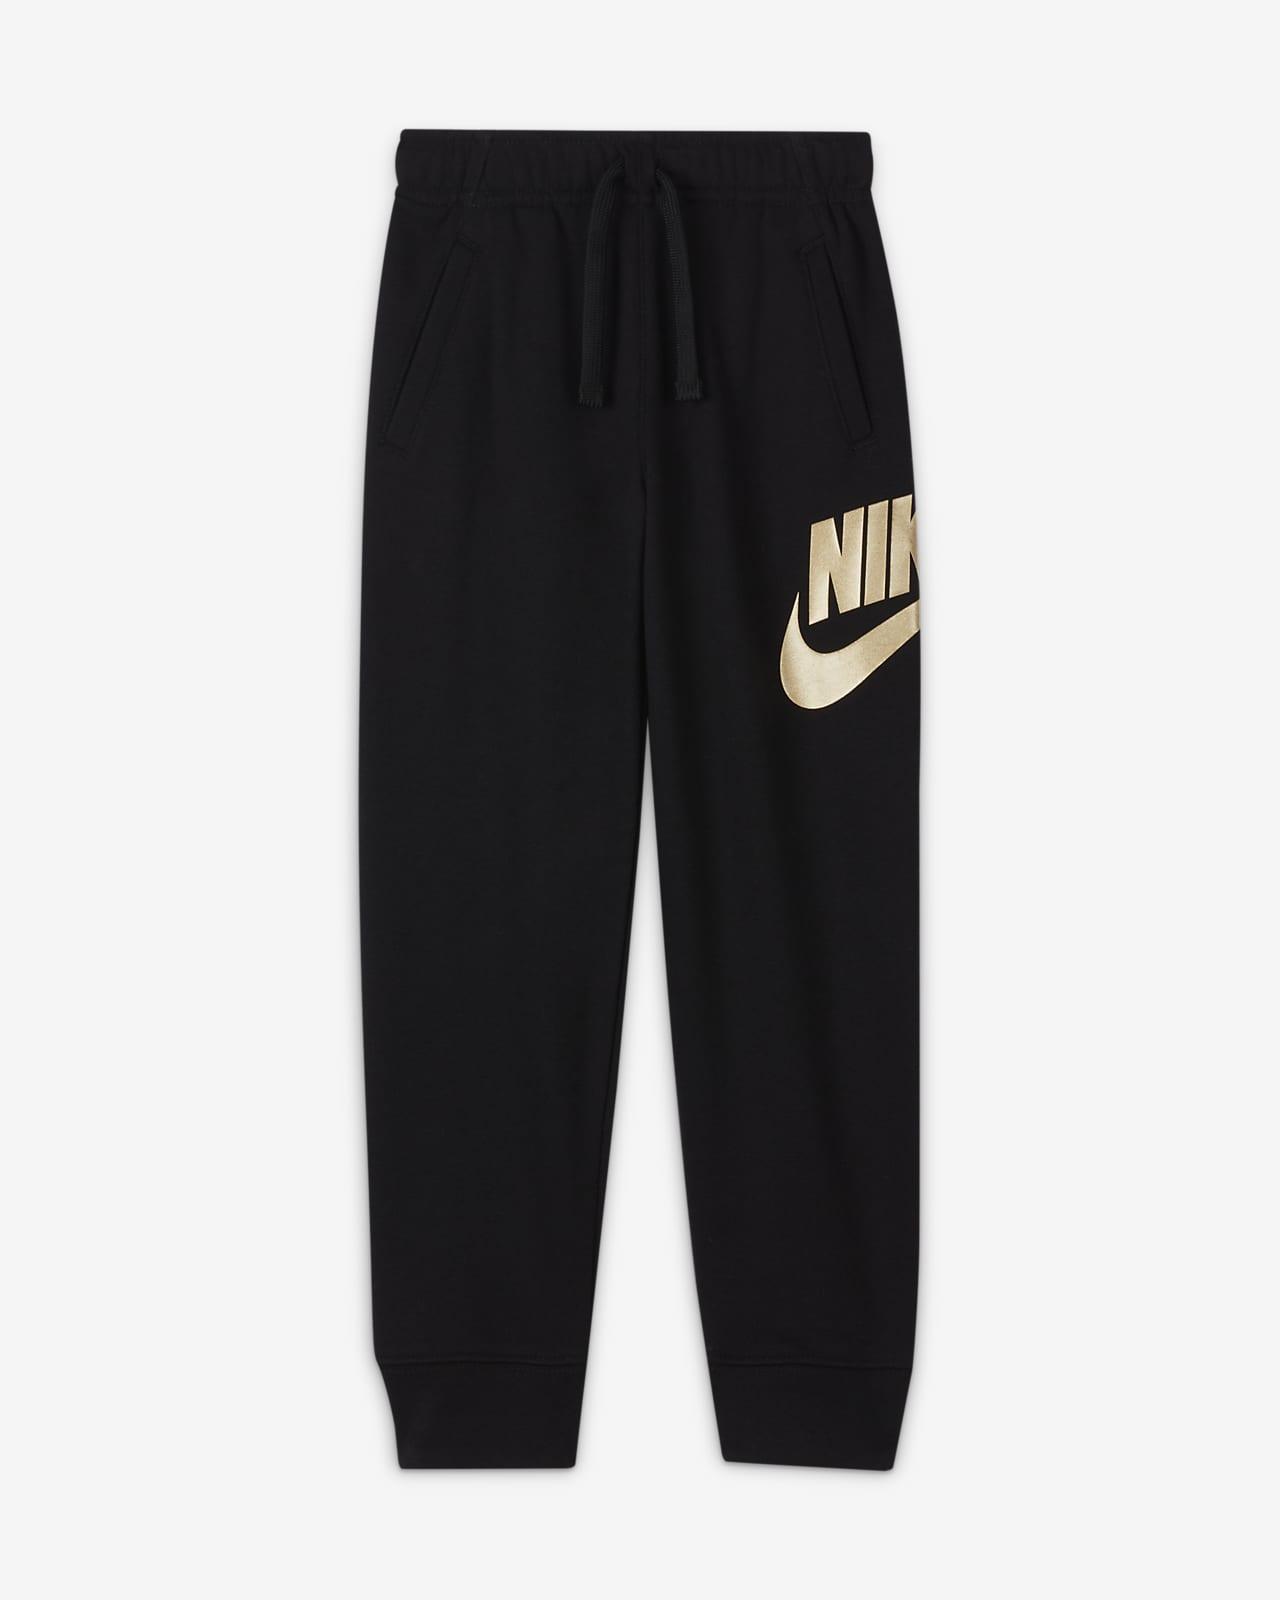 Nike Sportswear Club Fleece Hose für jüngere Kinder